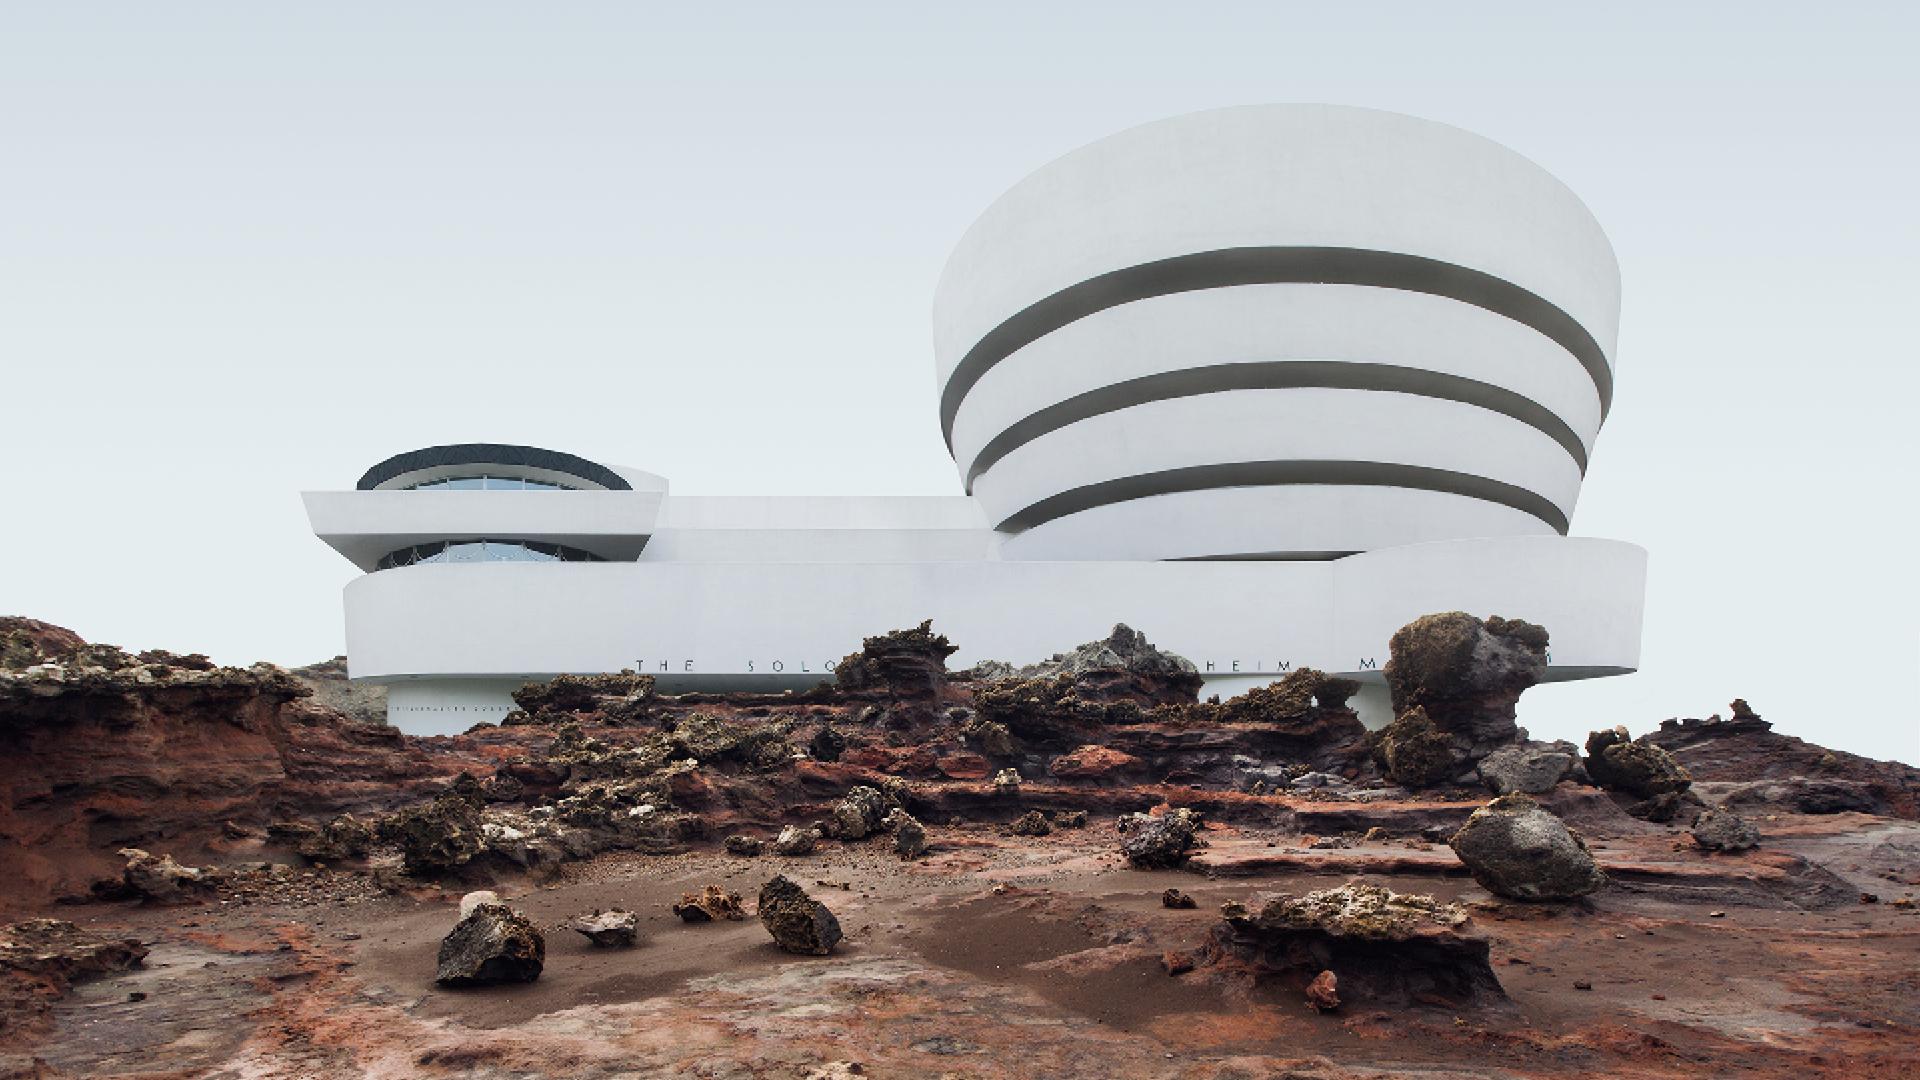 Misplaced - Solomon R. Guggenheim Museum| Misplaced Series | Anton Repponen | STIR